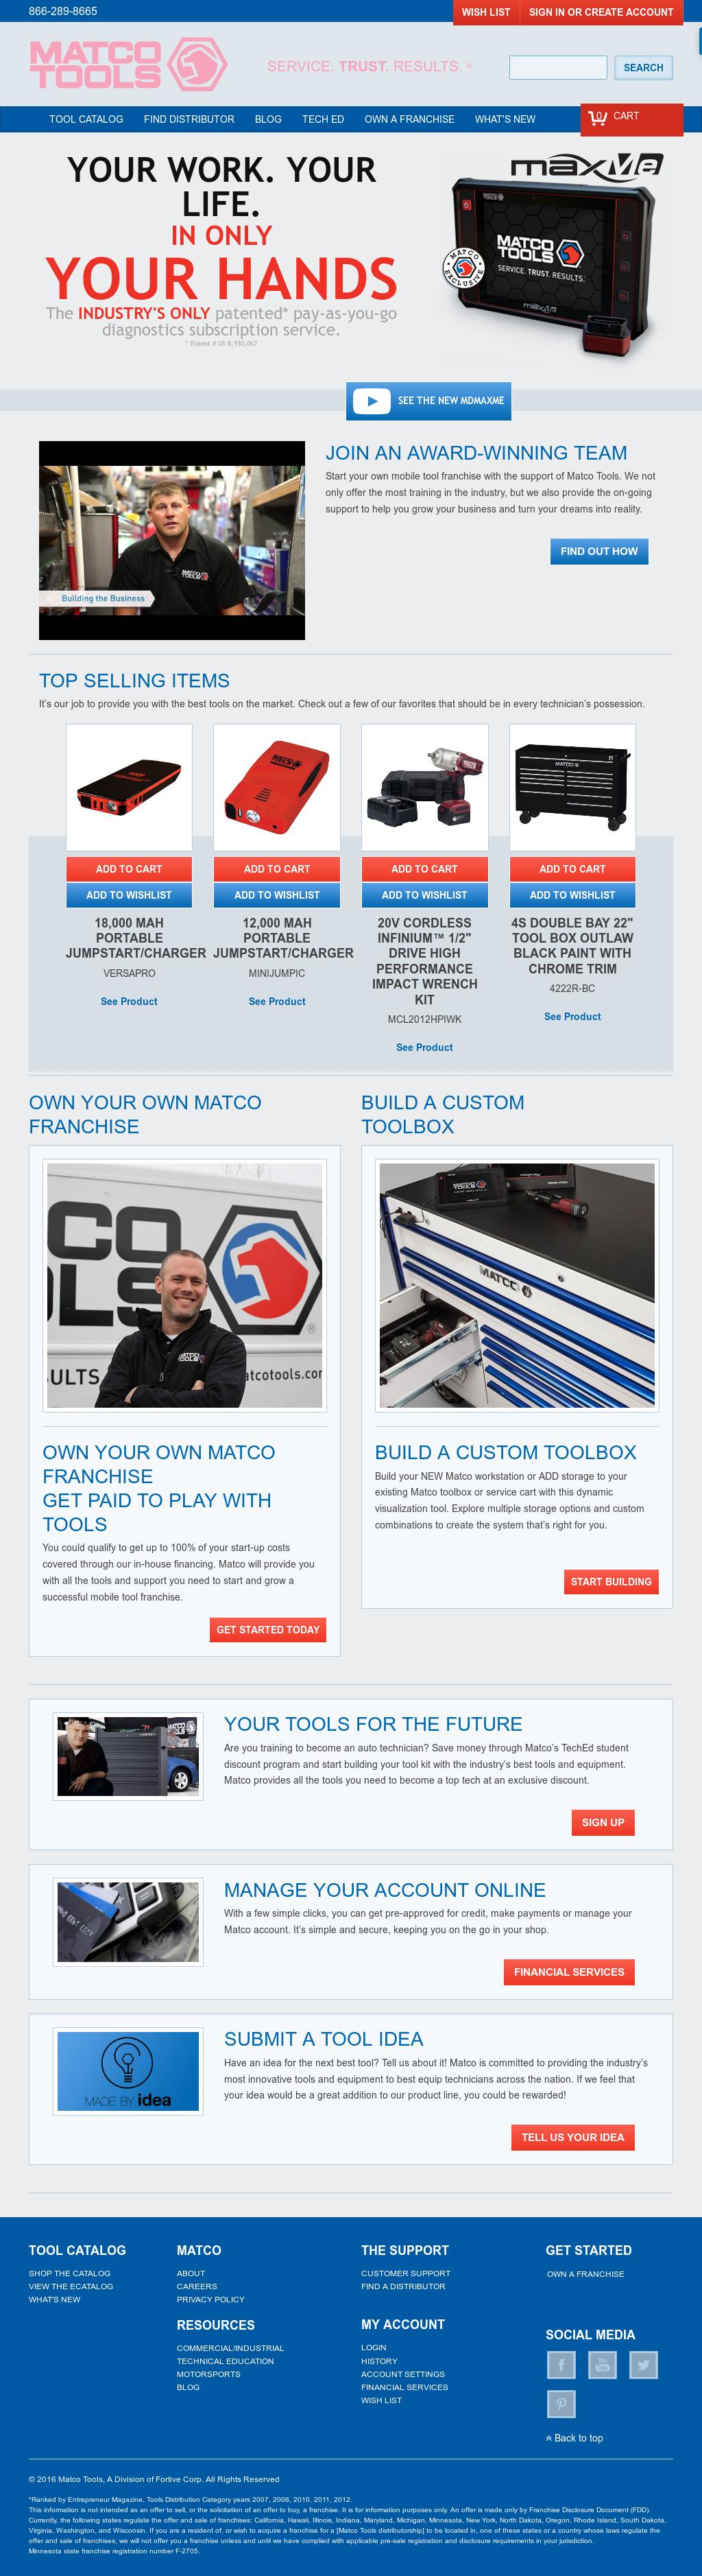 Matco Competitors, Revenue and Employees - Owler Company Profile